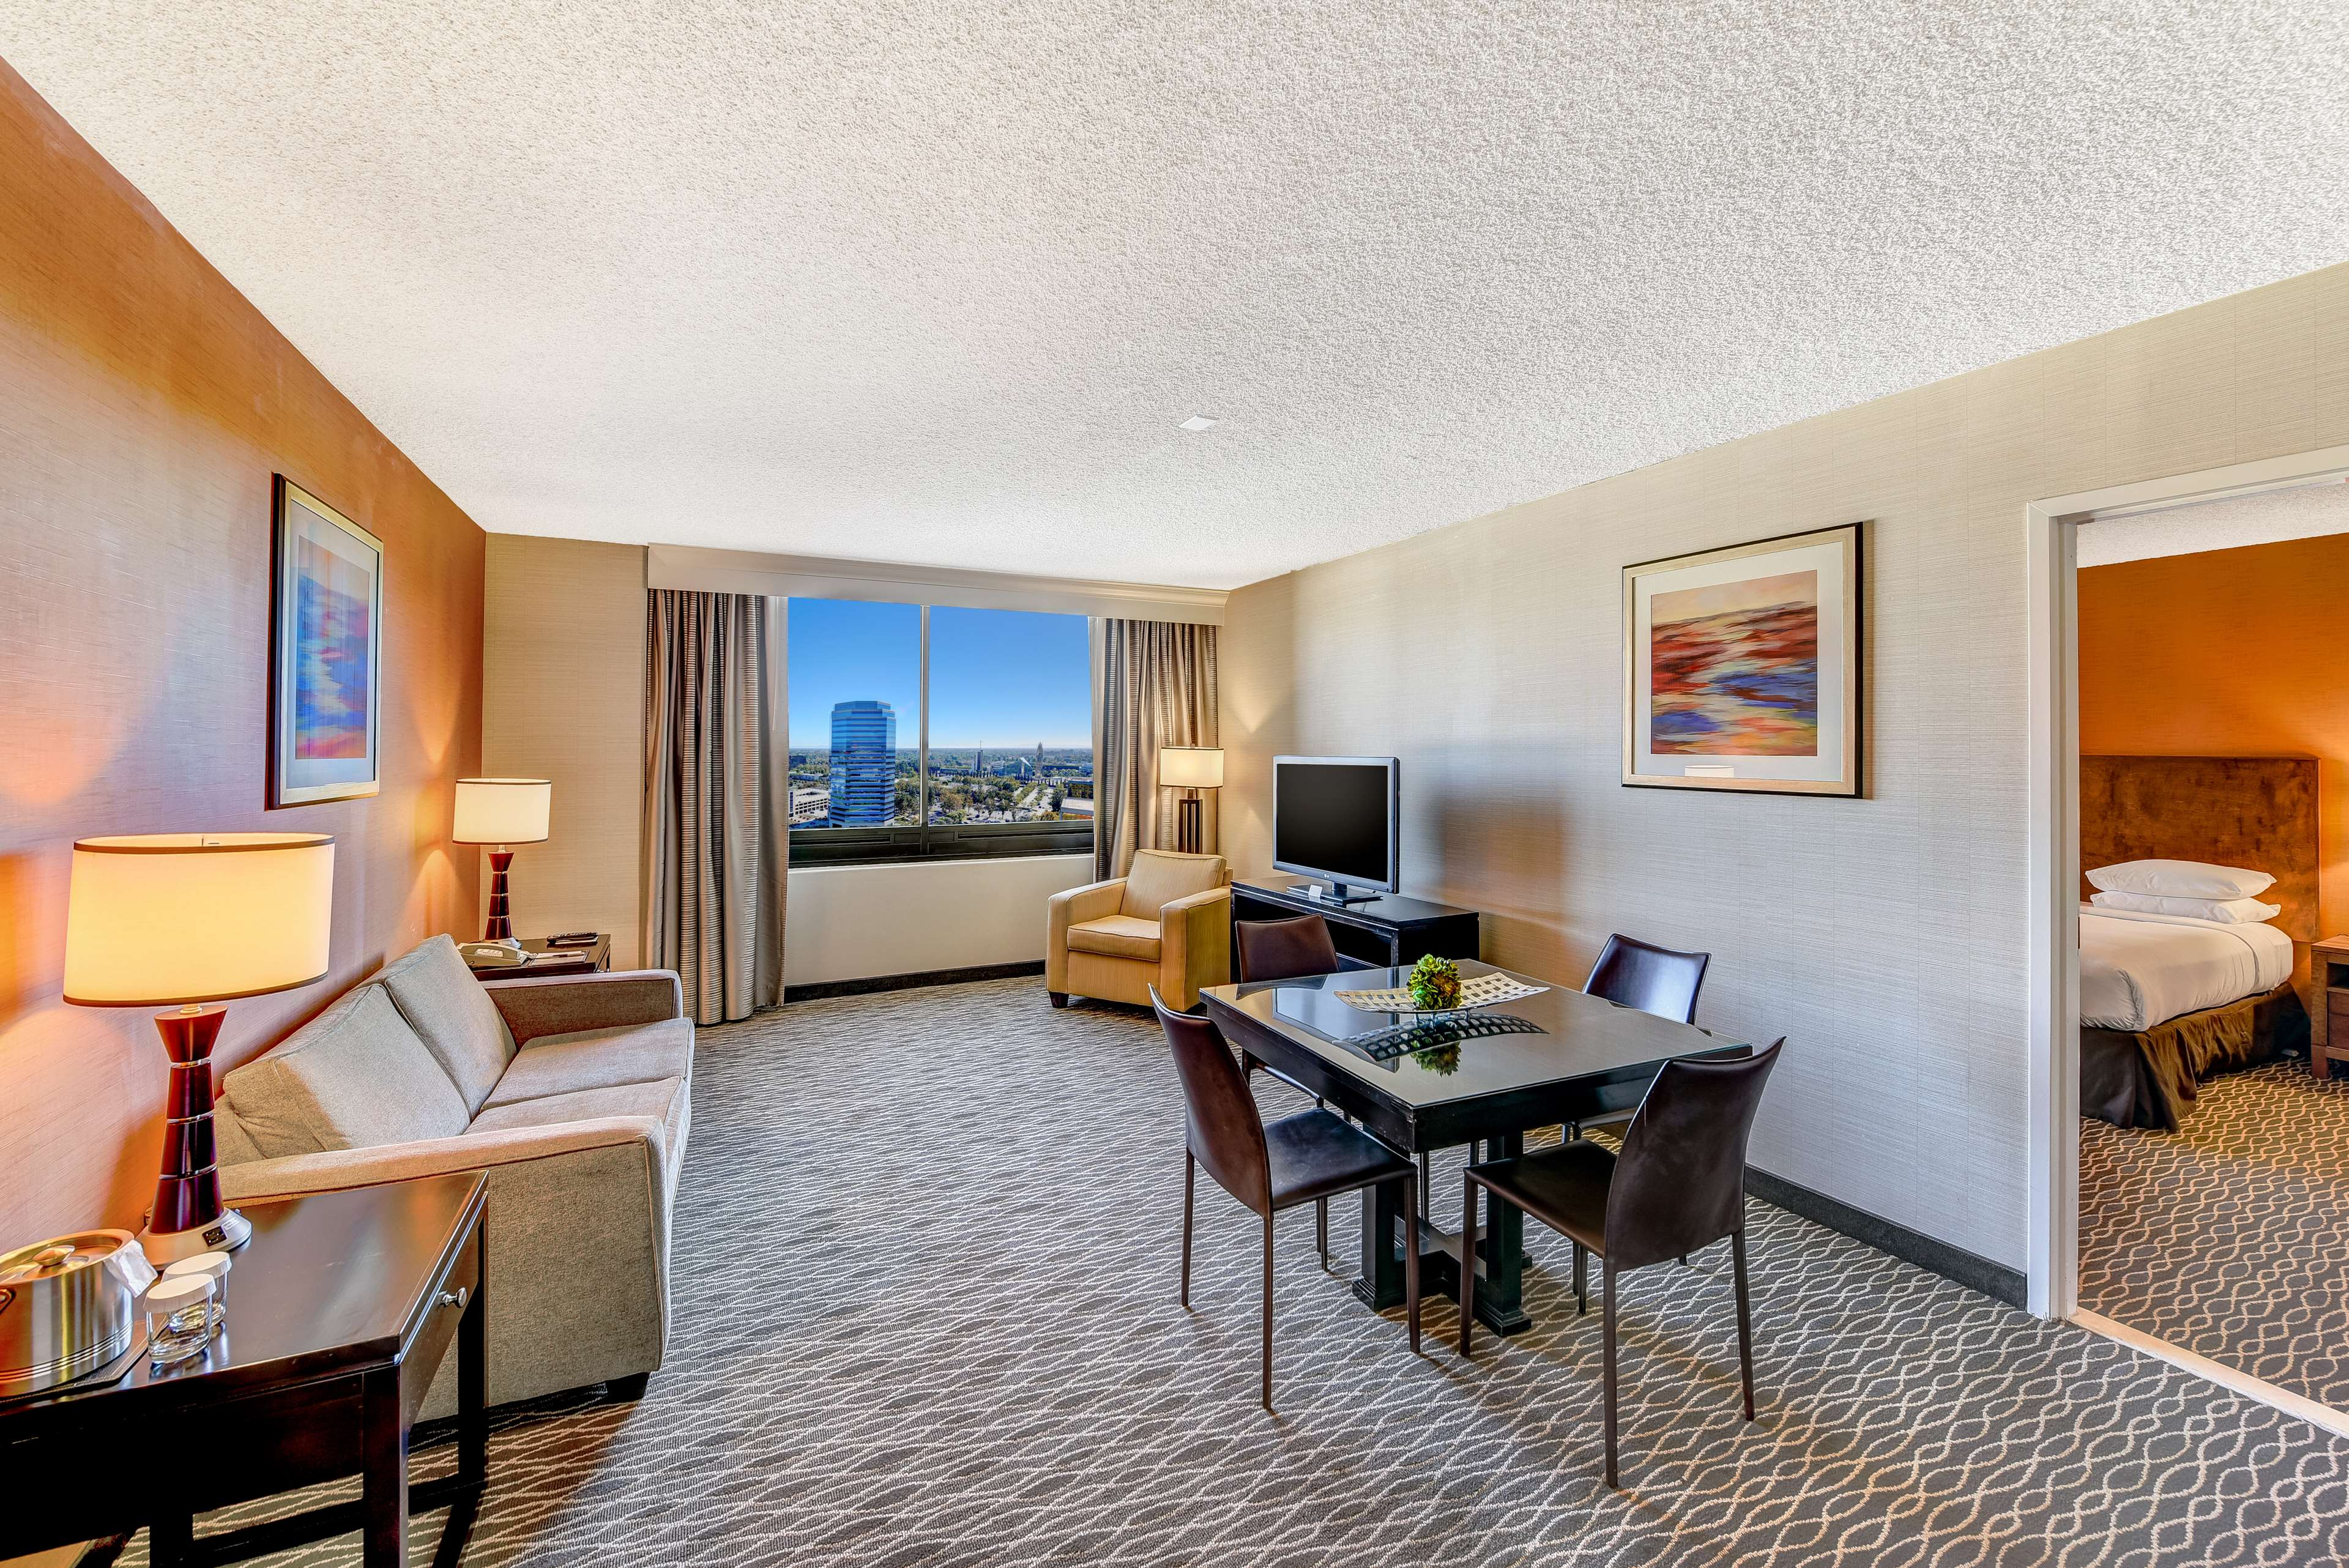 DoubleTree by Hilton Hotel Anaheim - Orange County image 40